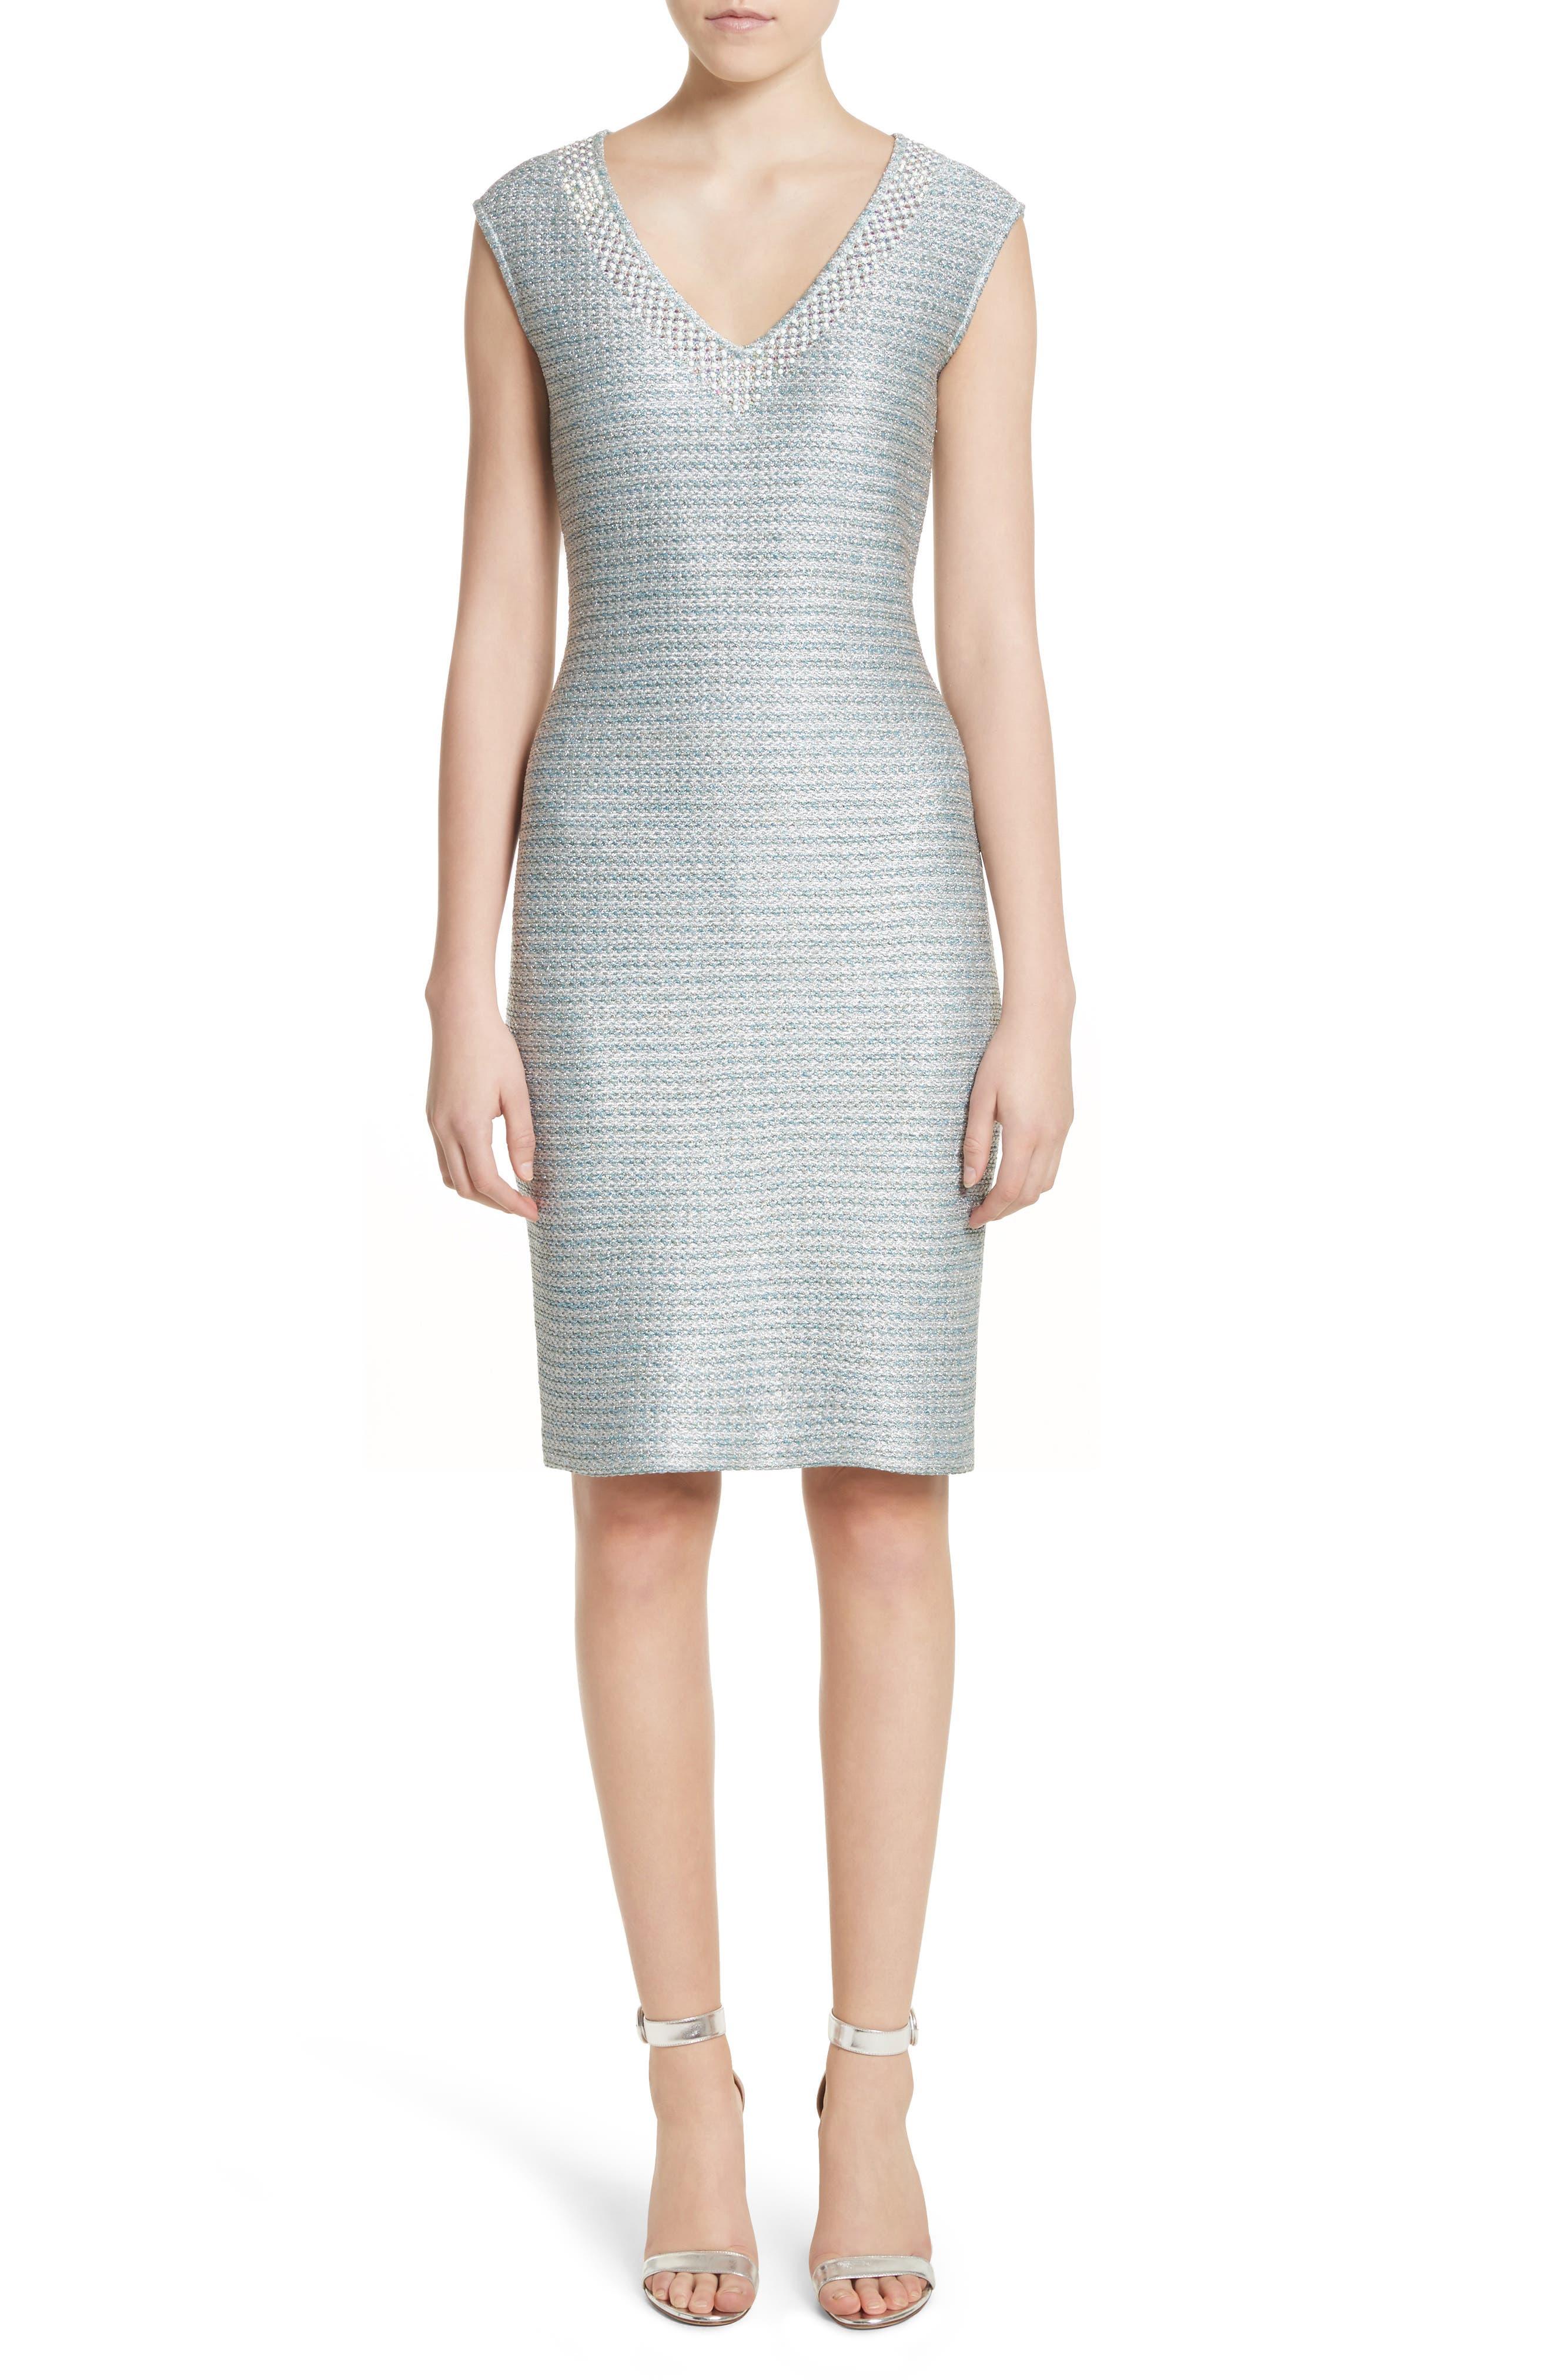 Alternate Image 1 Selected - St. John Collection Gleam Metallic Knit Sheath Dress